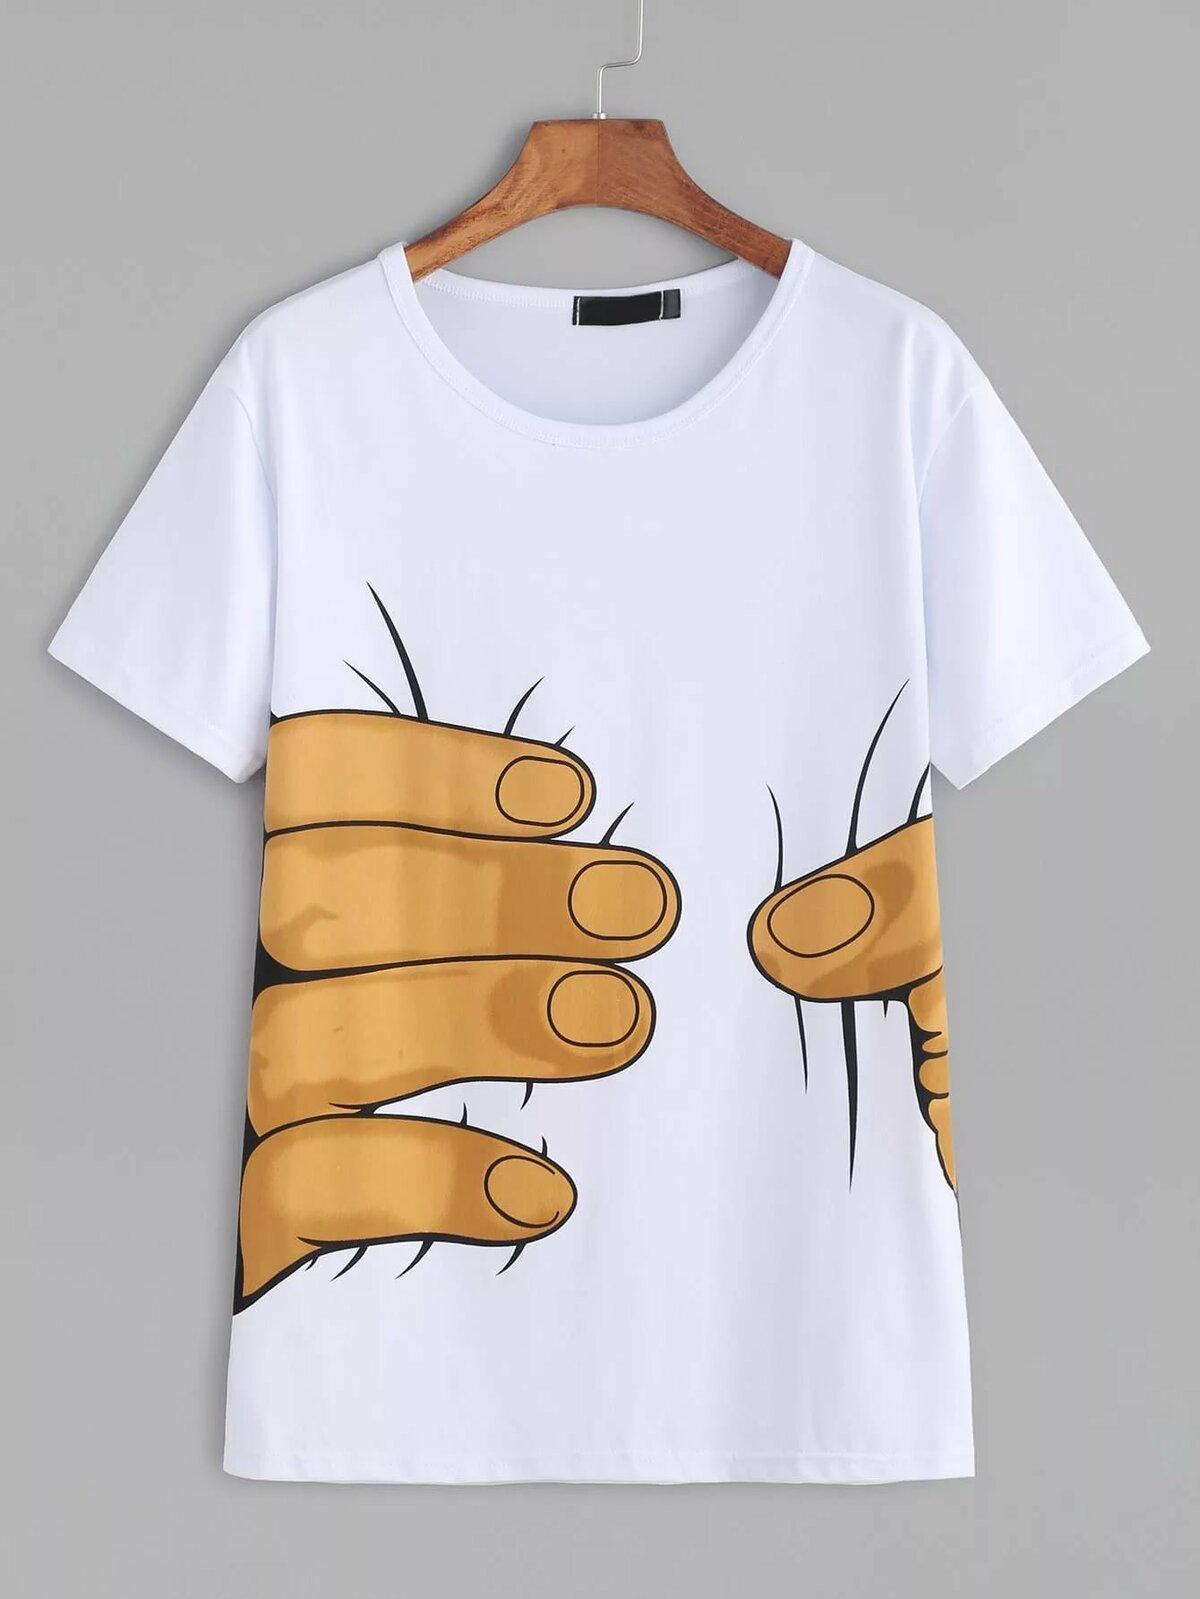 коллекция футболку картинка рук материал также покрывают